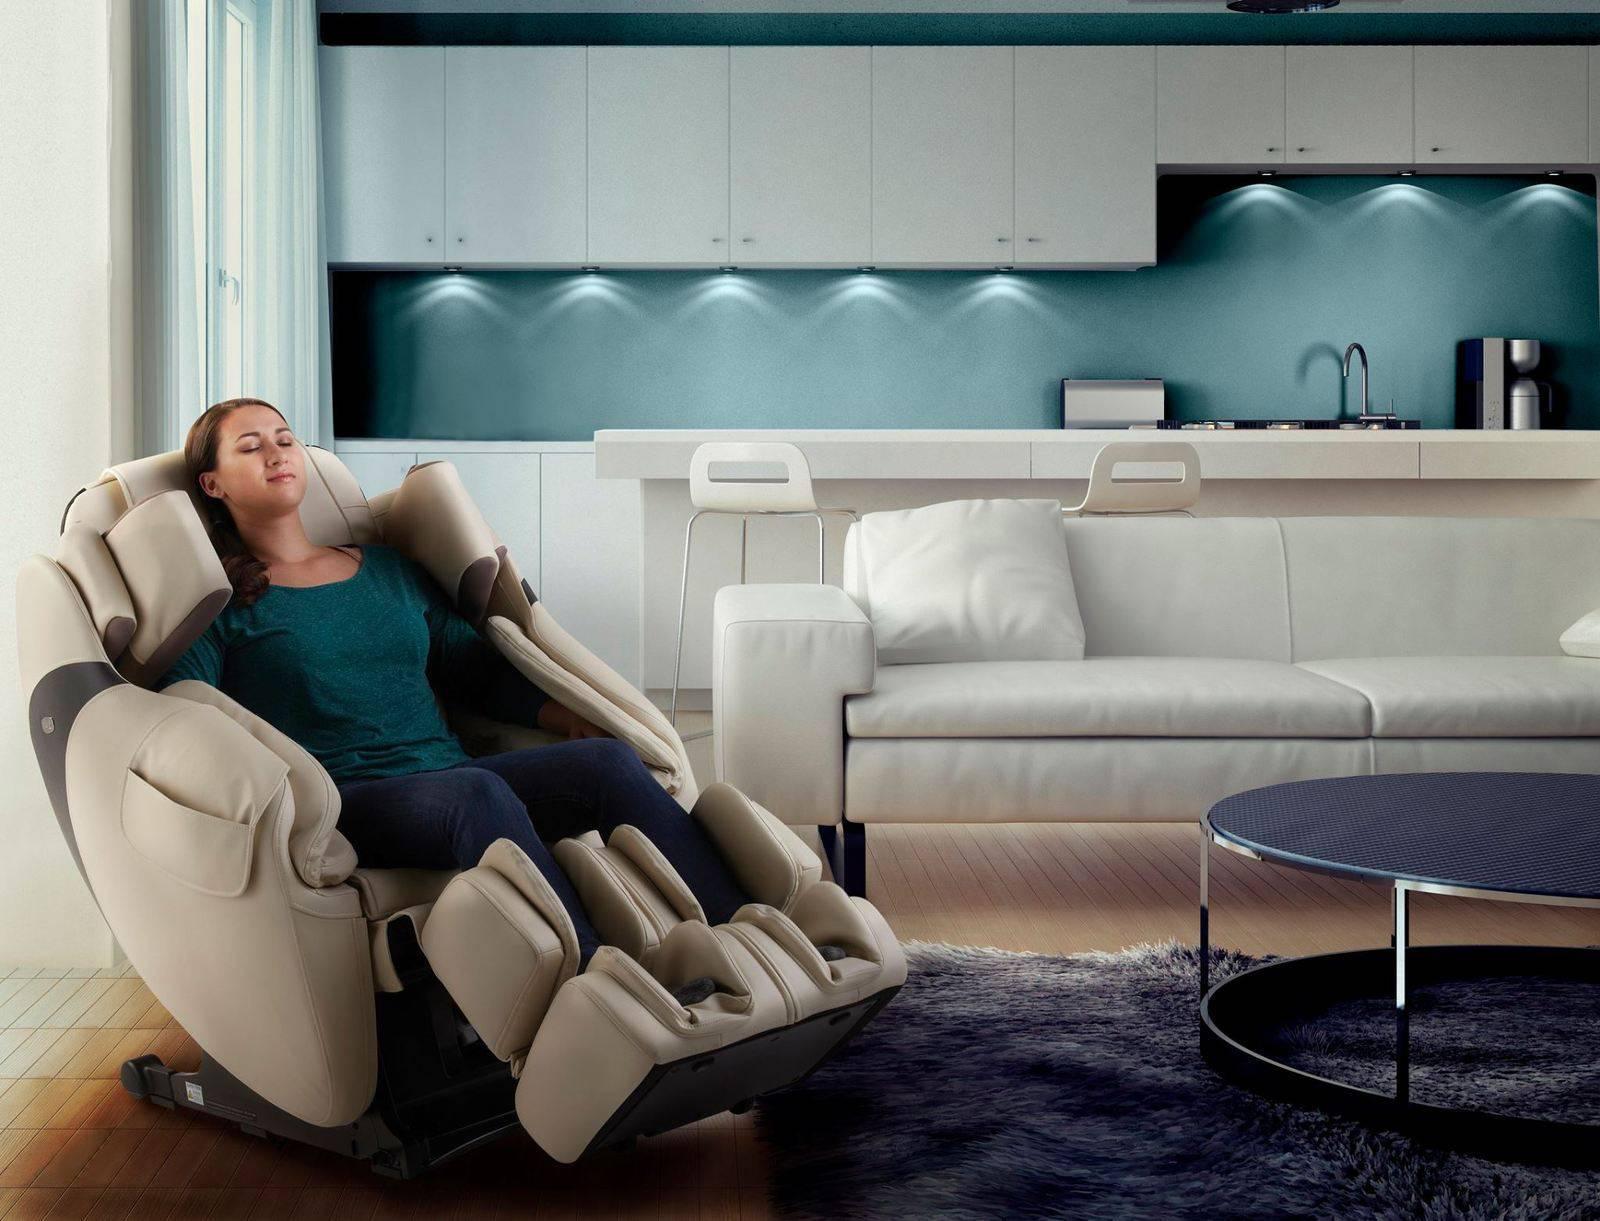 Inada 3S Medical Massage Chair Australia | Inada Massage ...